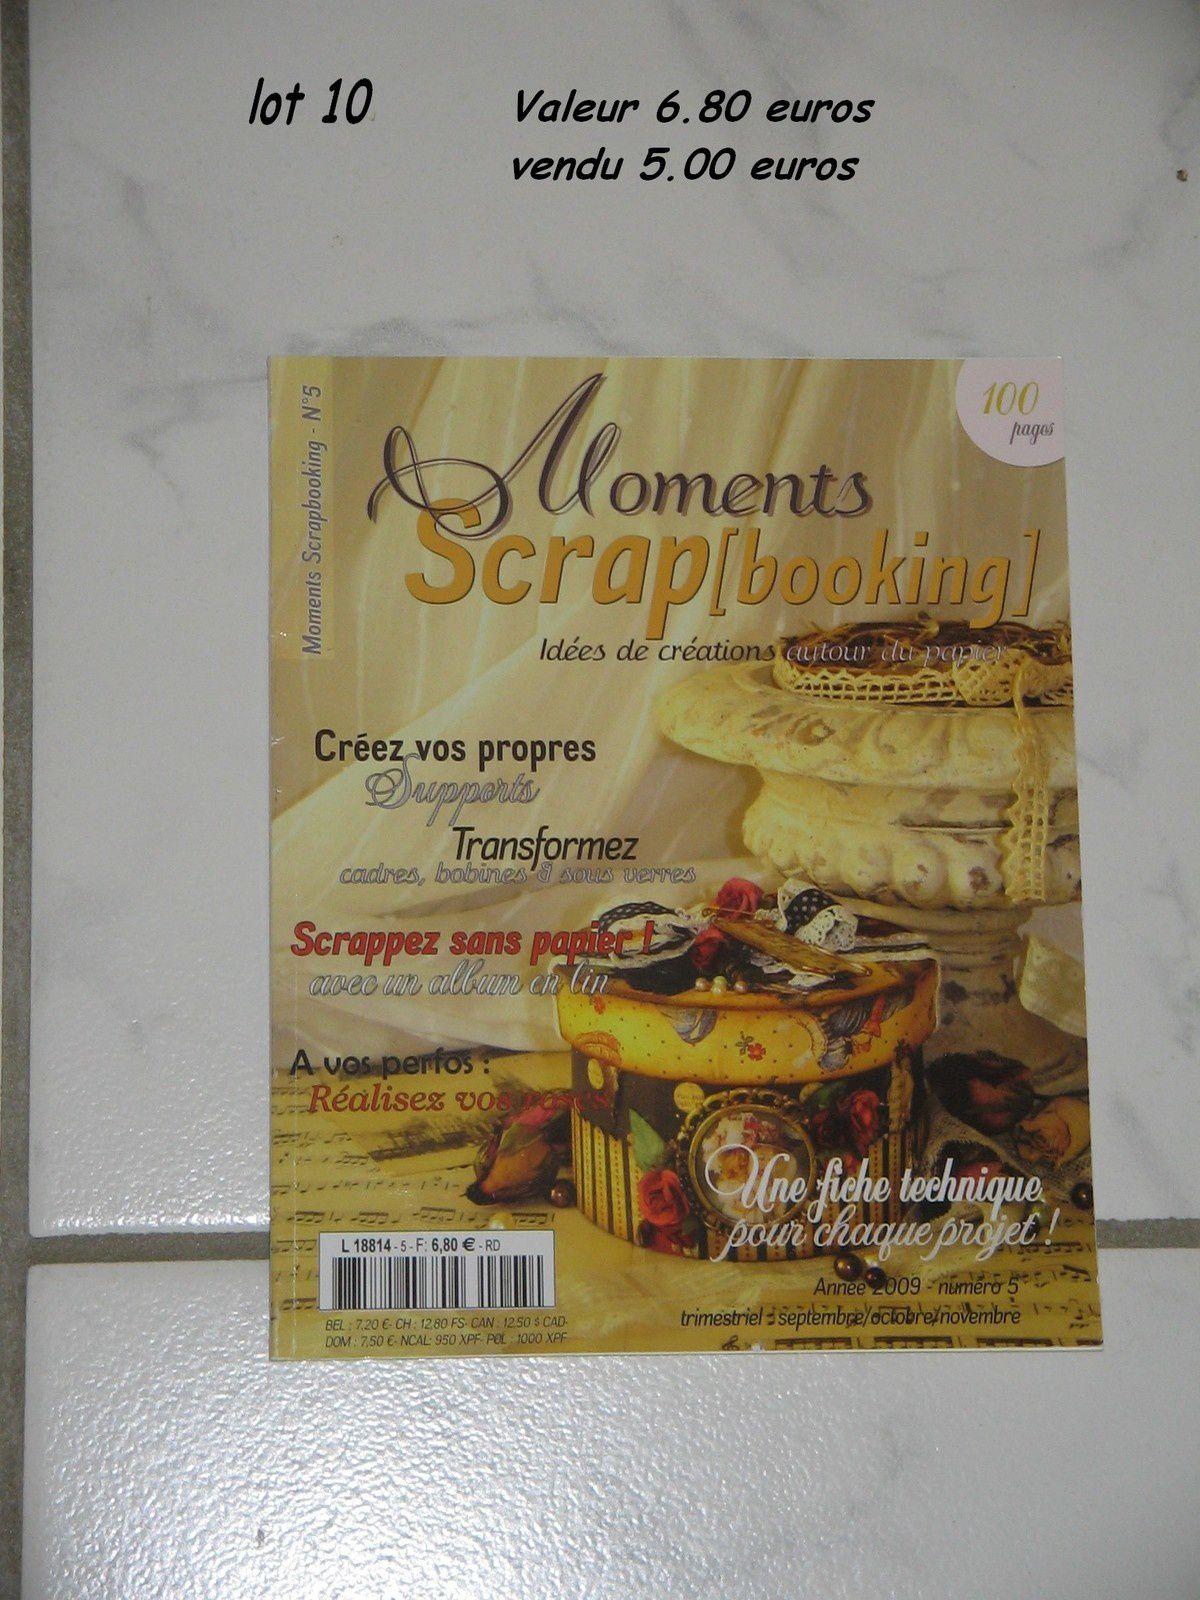 Livres de scrapbooking à vendre